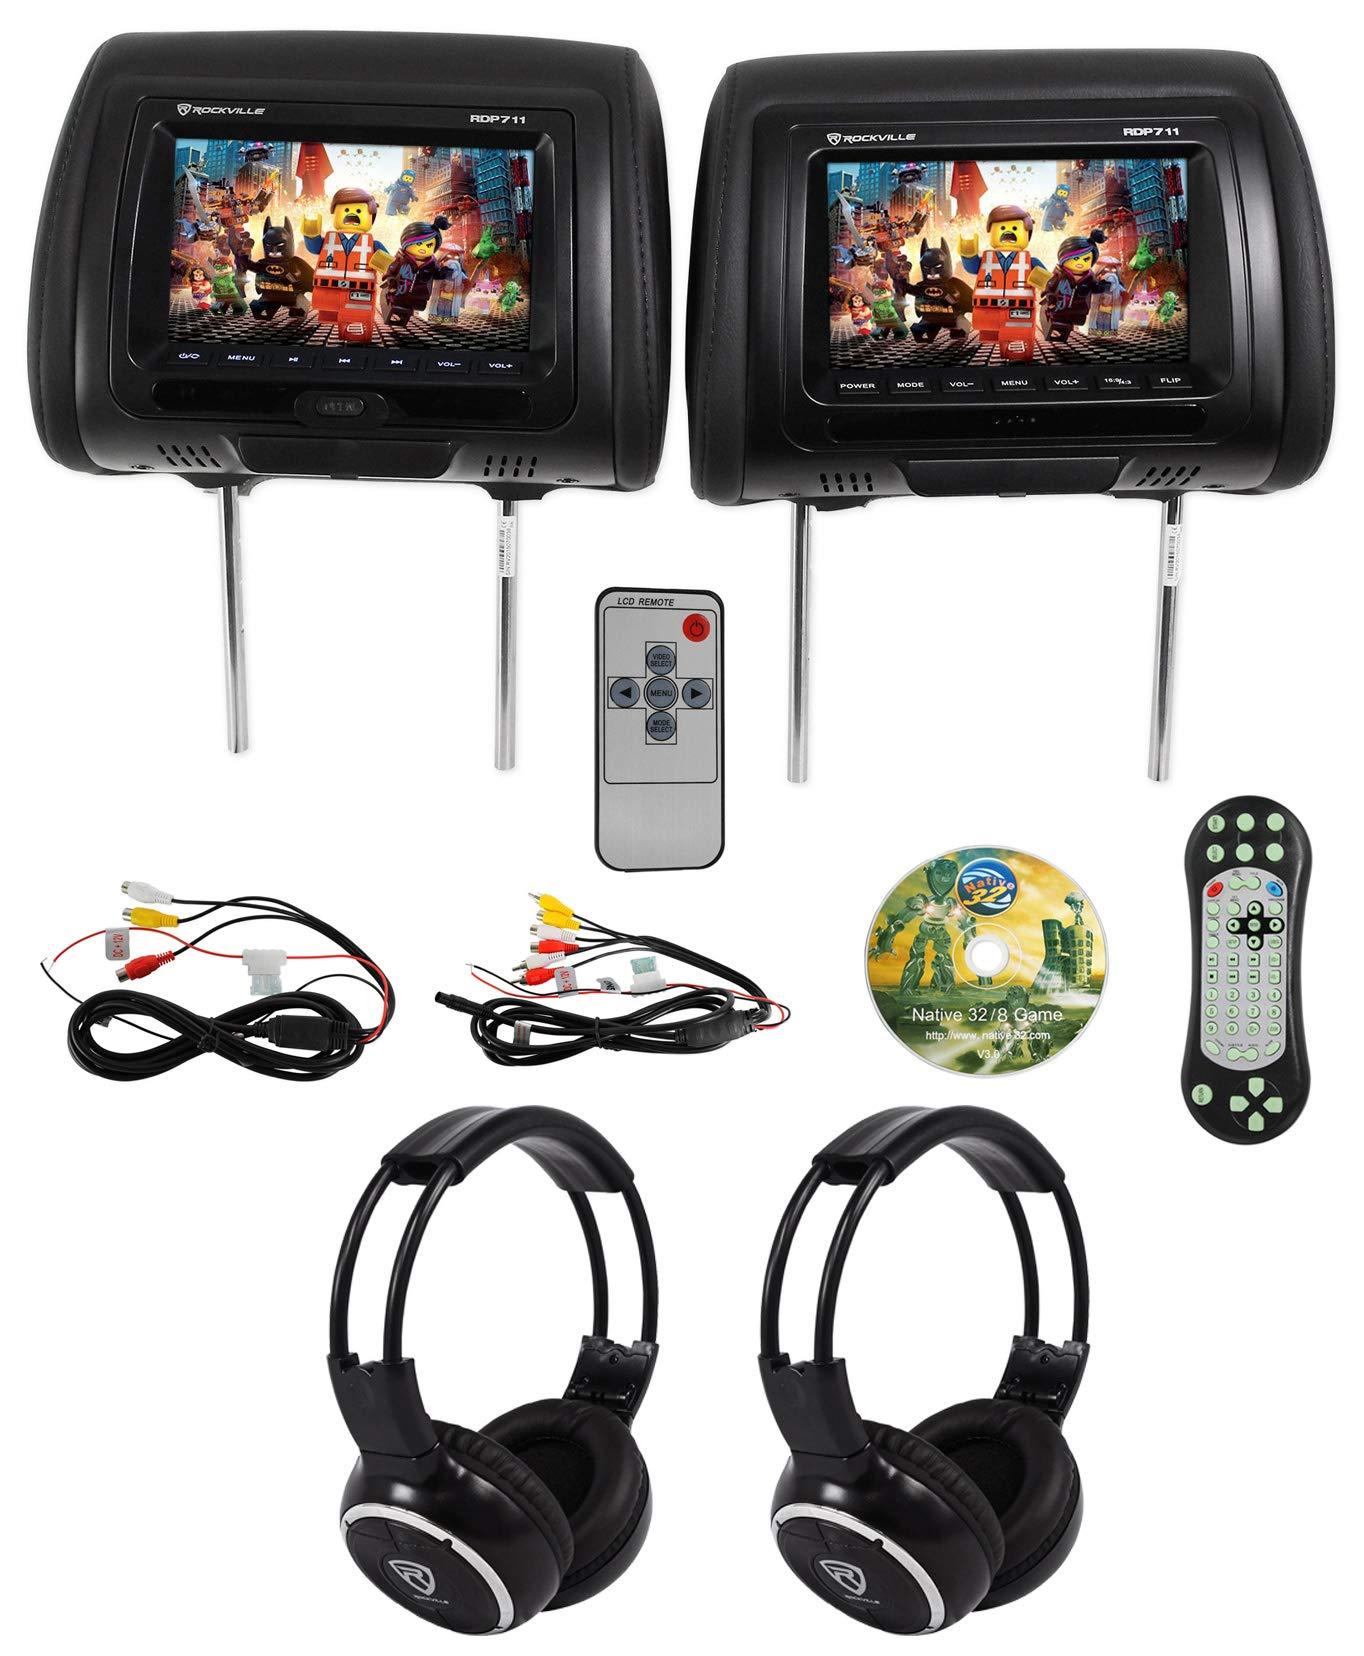 Rockville RDP711 BK Headrest Monitors Headphones